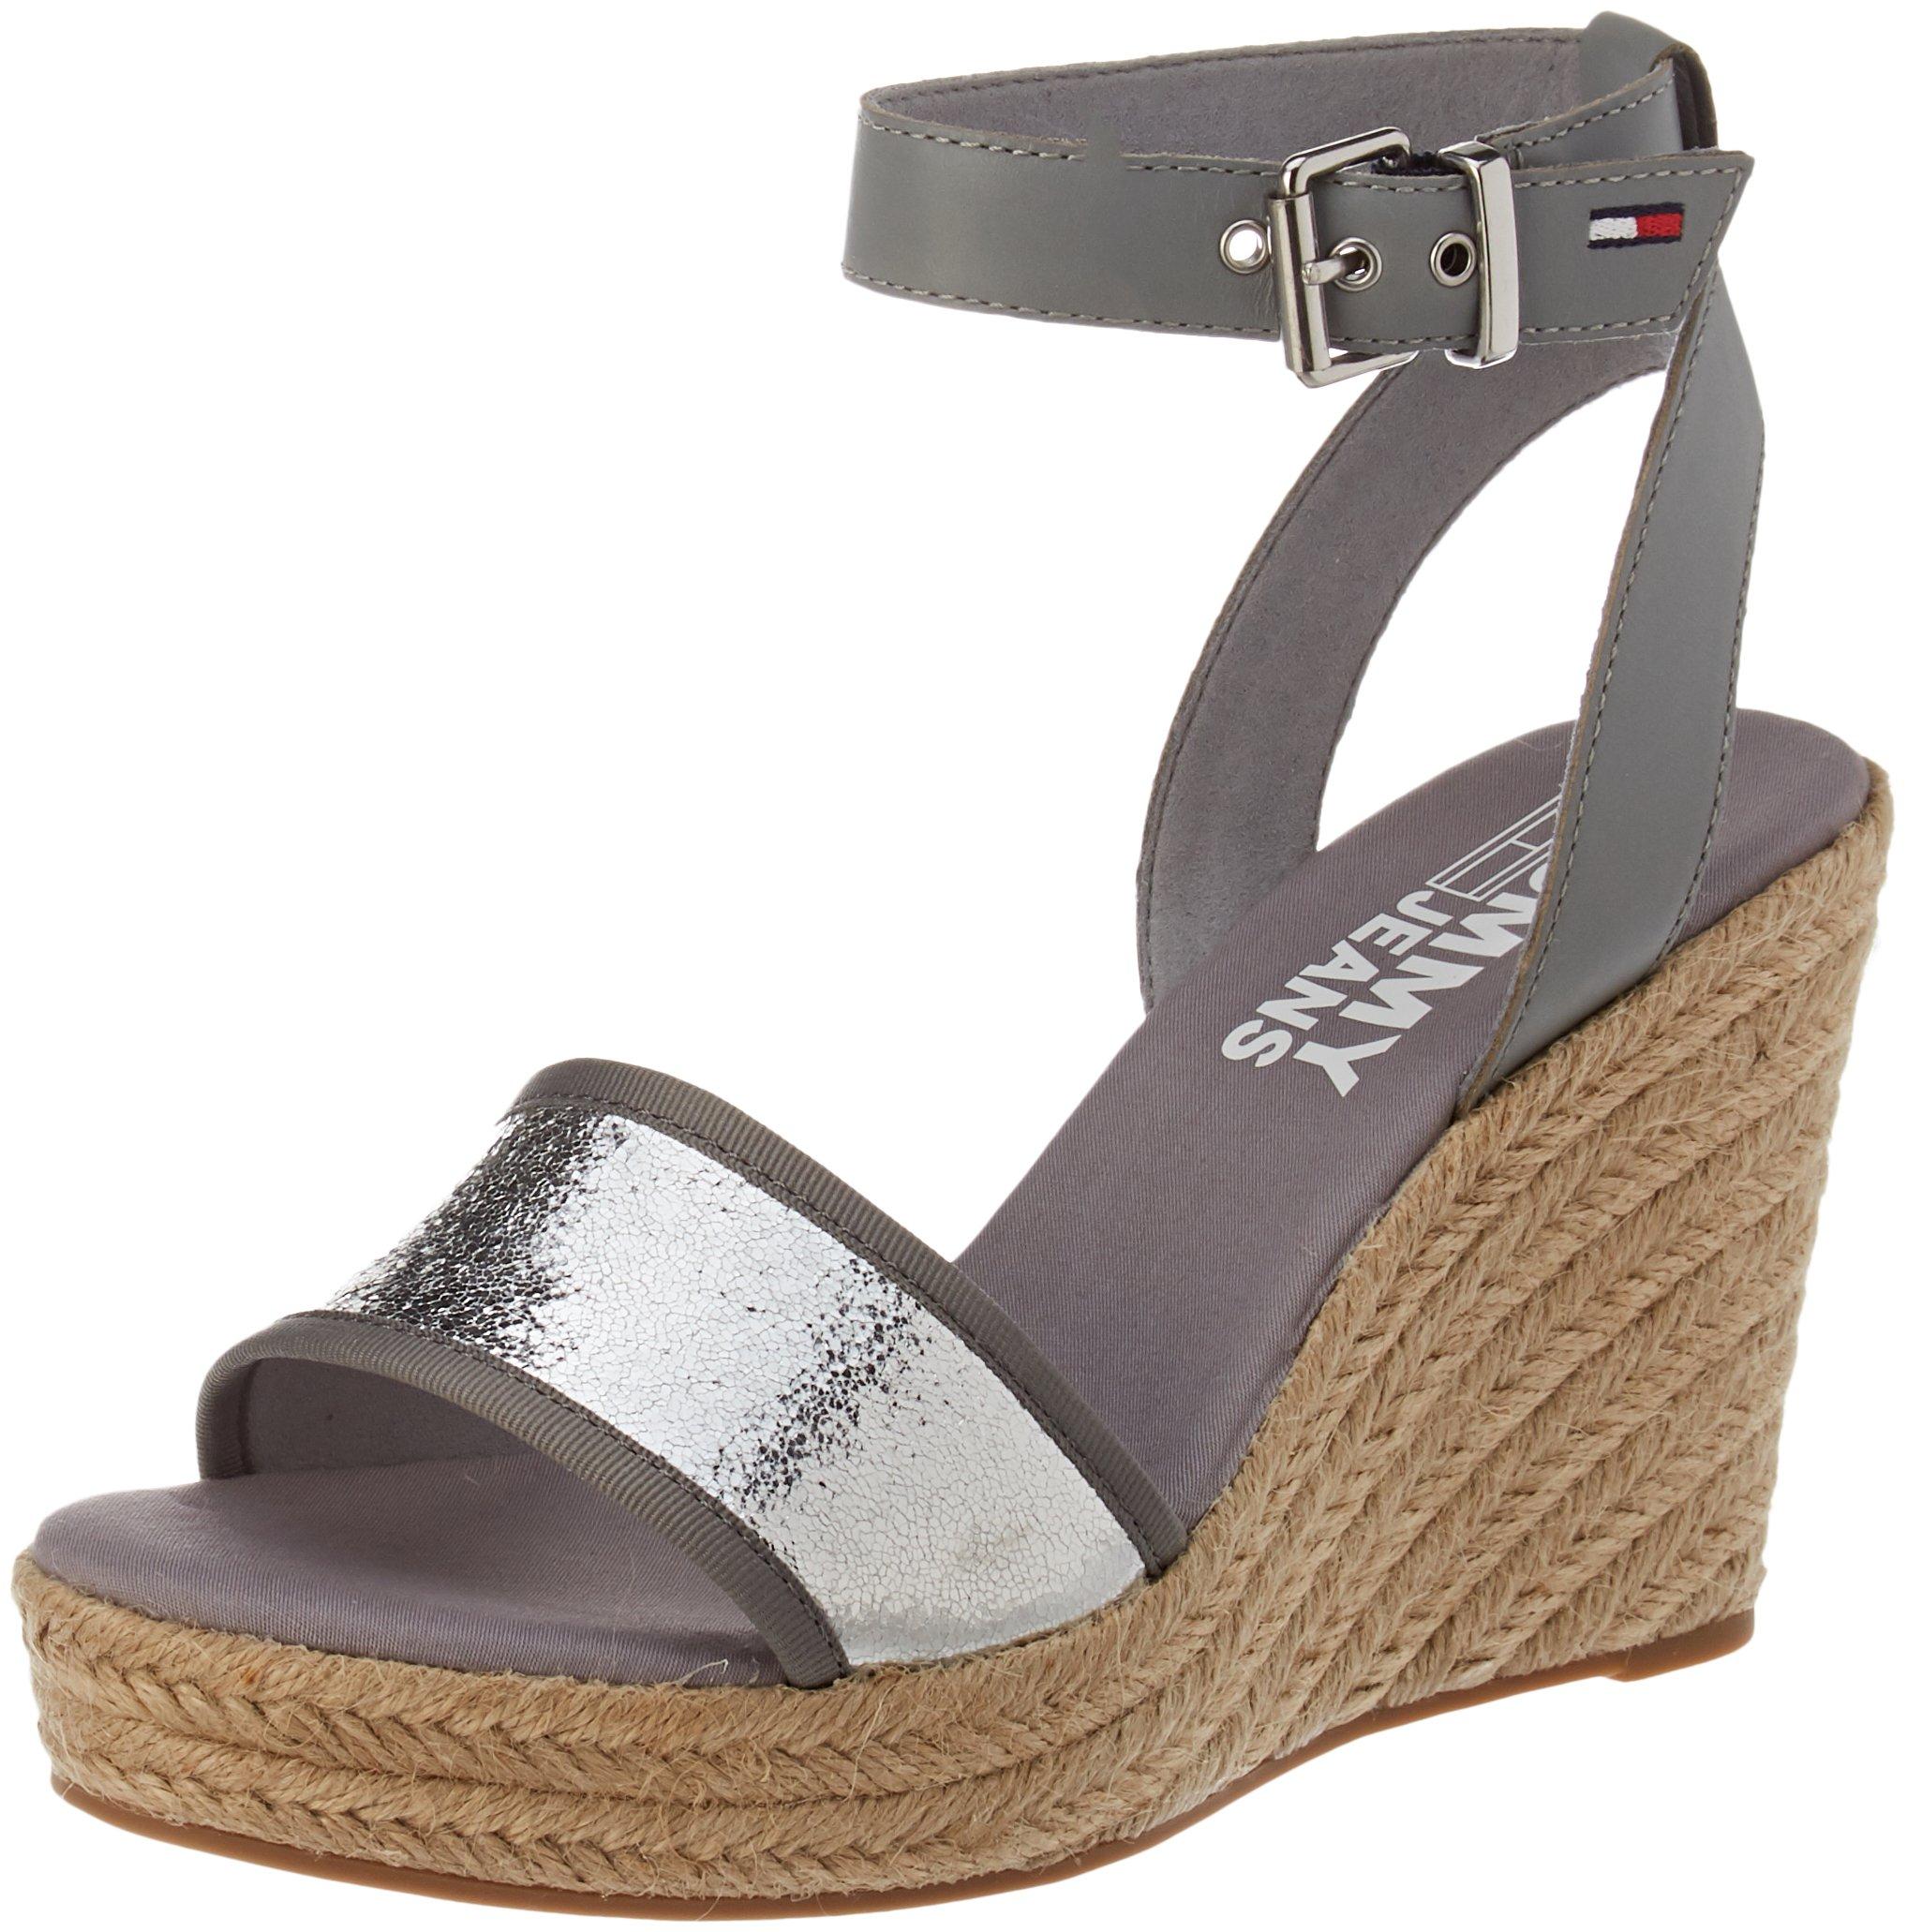 Tommy Hilfiger Denim Wedge SandalEspadrilles Jeans FemmeArgentsilver Metallic Eu 00040 H9D2YEIW